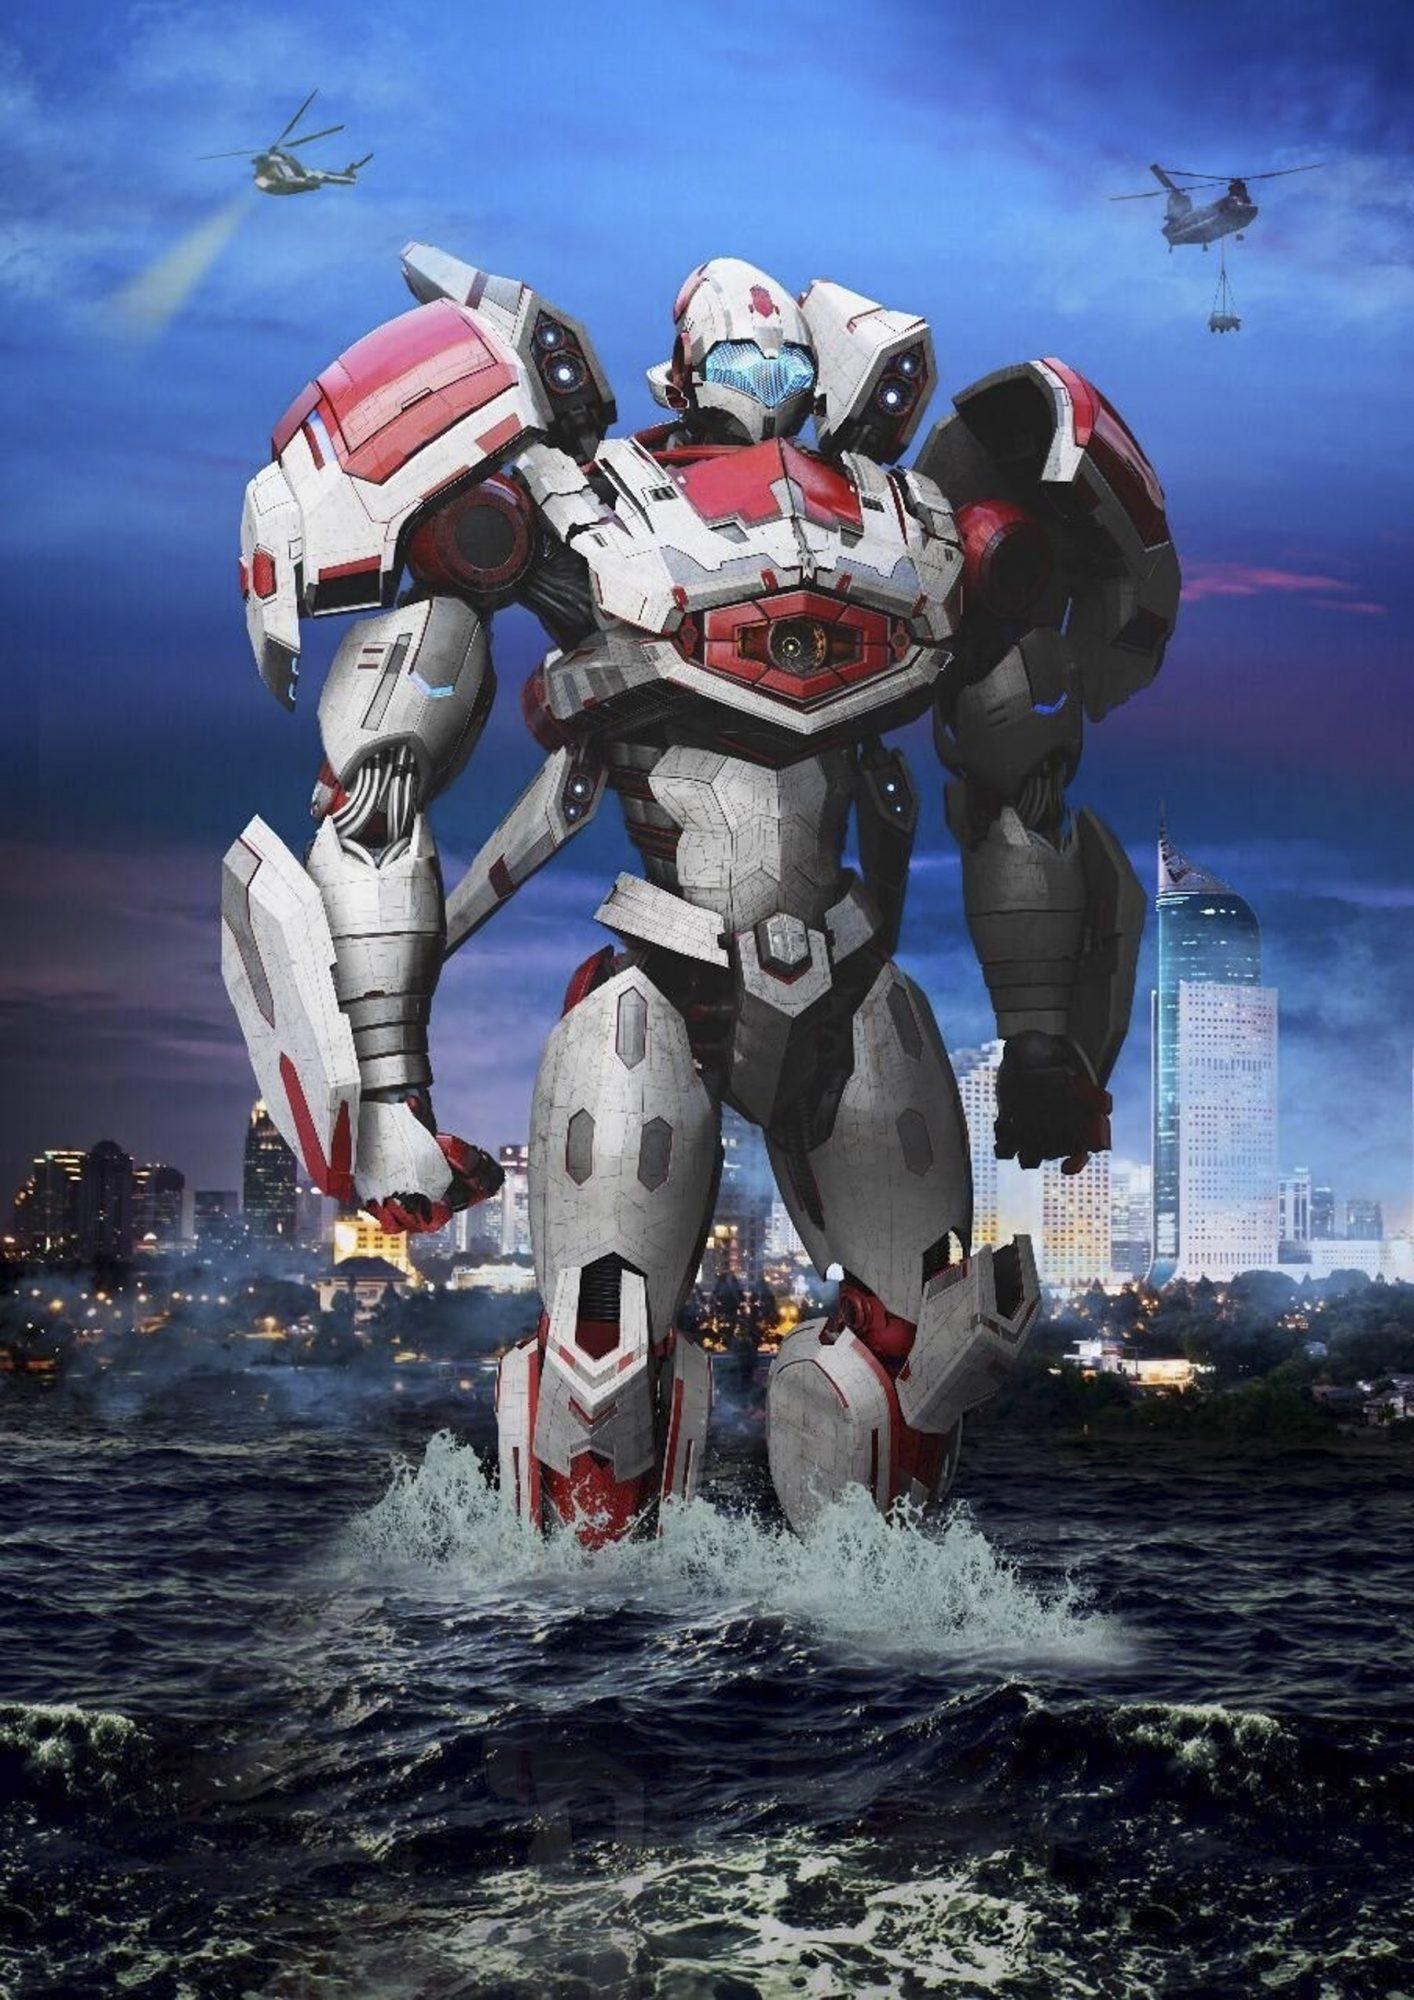 Pacific Rim's new Mark VII Jaegar, Storm Garuda. The new jaegar makes it's debut in the Pacific Rim: Shatterdome Strike Attraction 3D film.